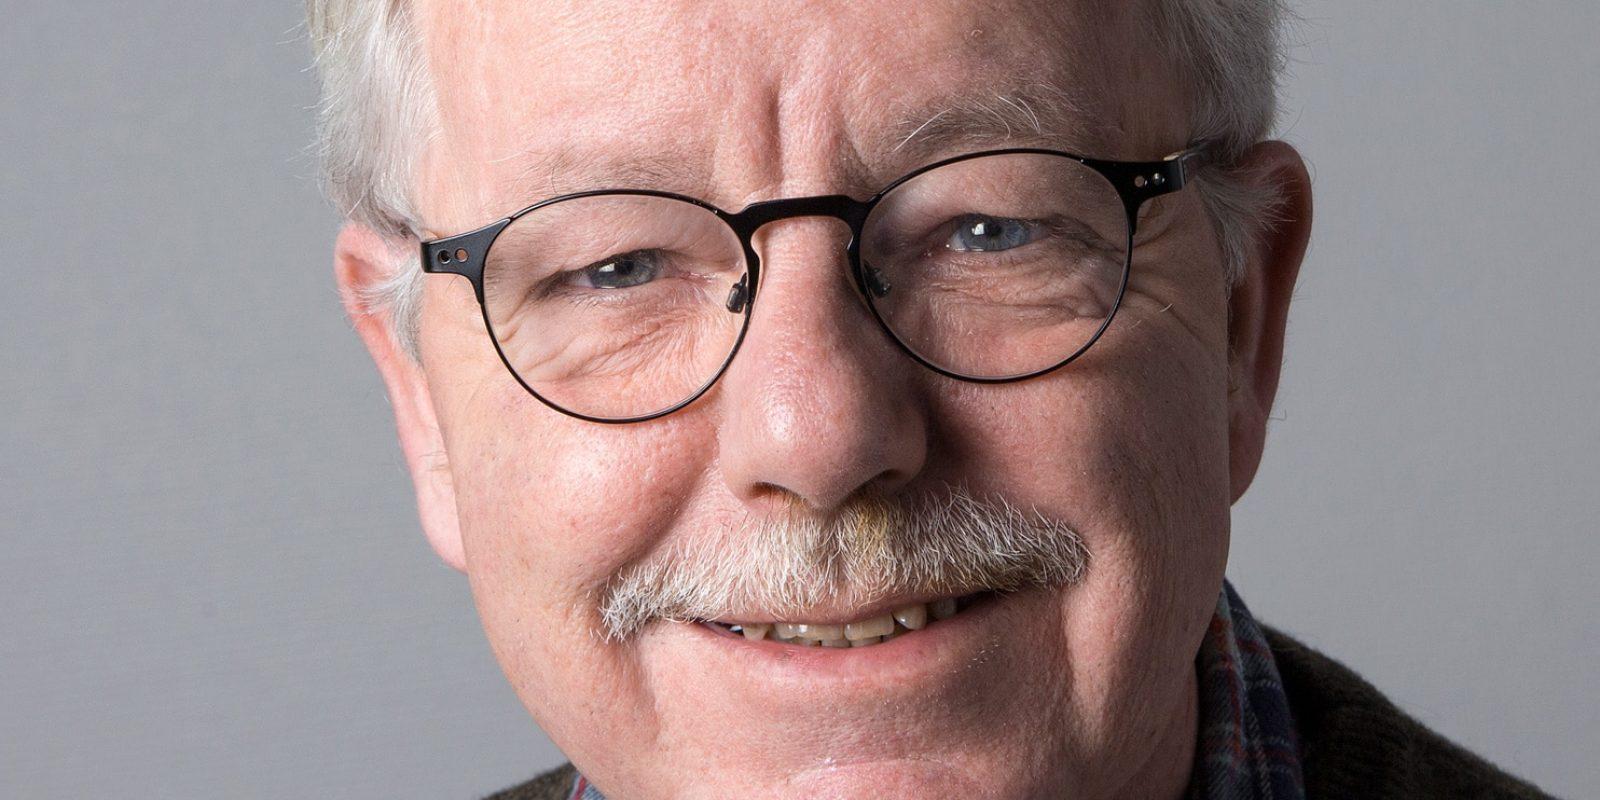 Søren Ottzen